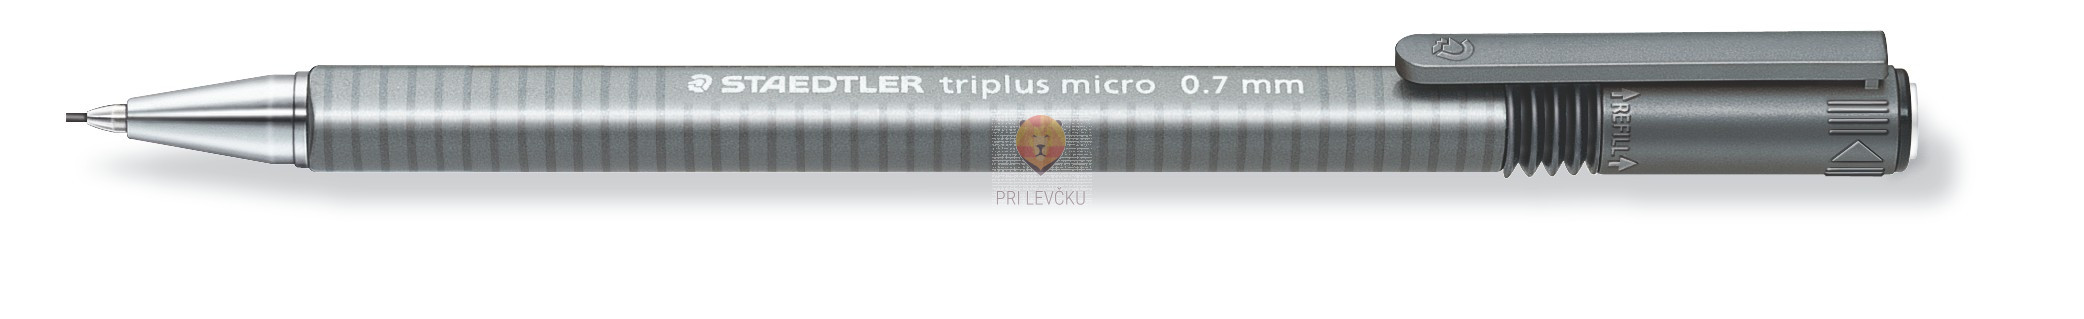 triplus tehnični svinčnik